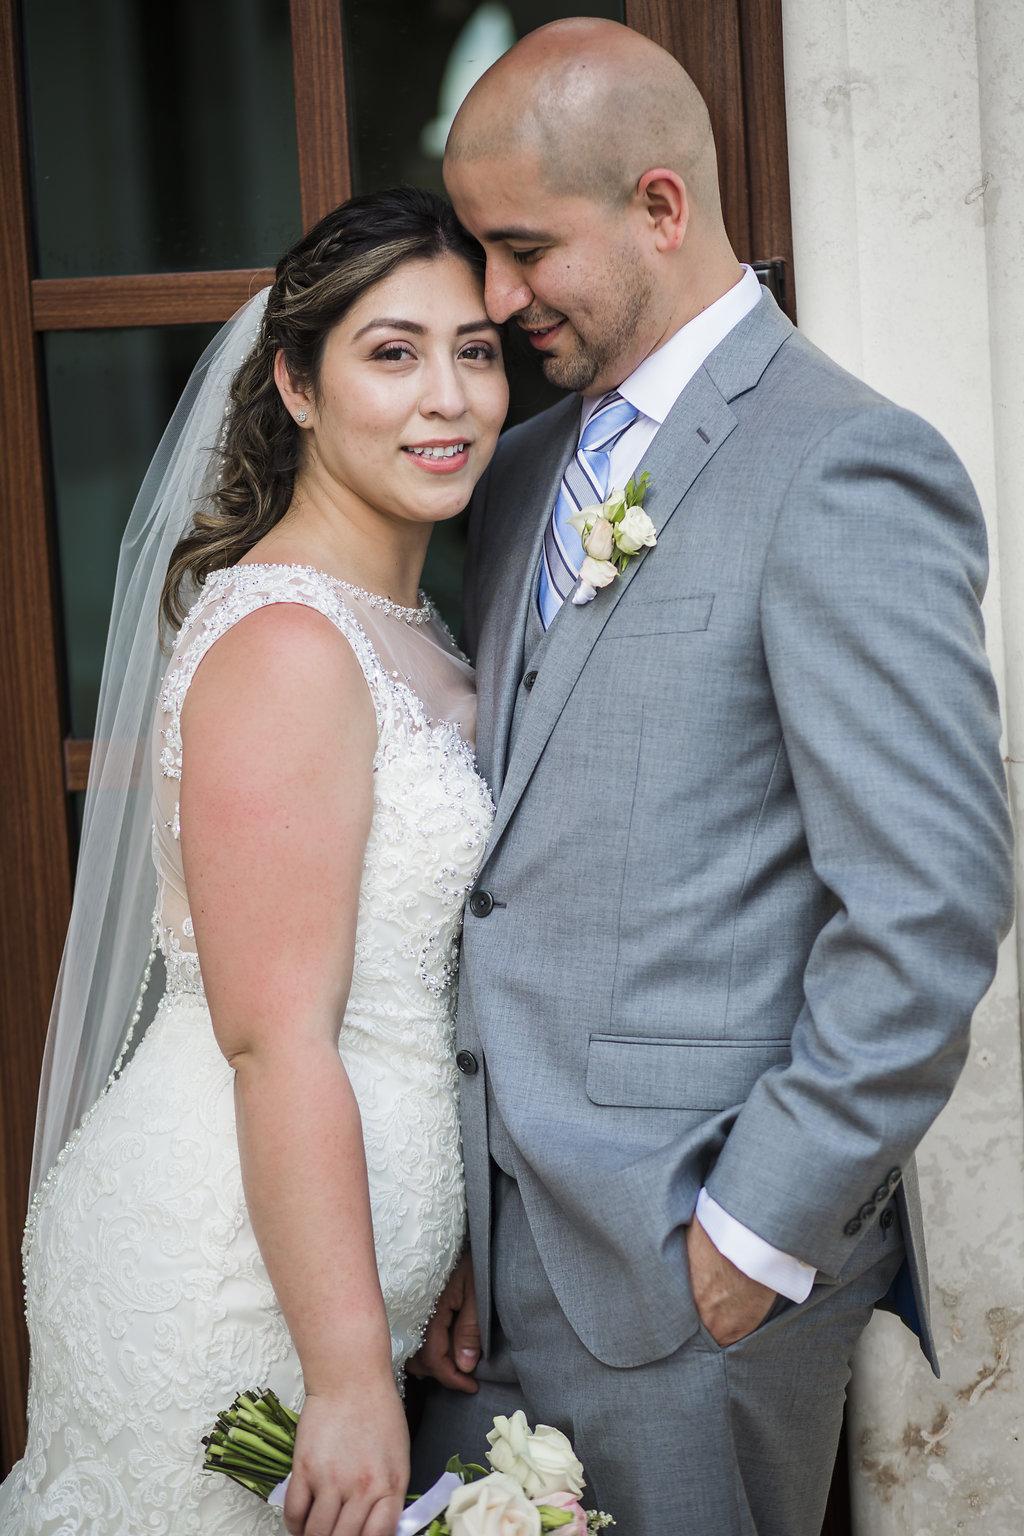 yesica-jose-beach-wedding-Villa-La-Joya--Playa-del-carmen-01--22.jpg